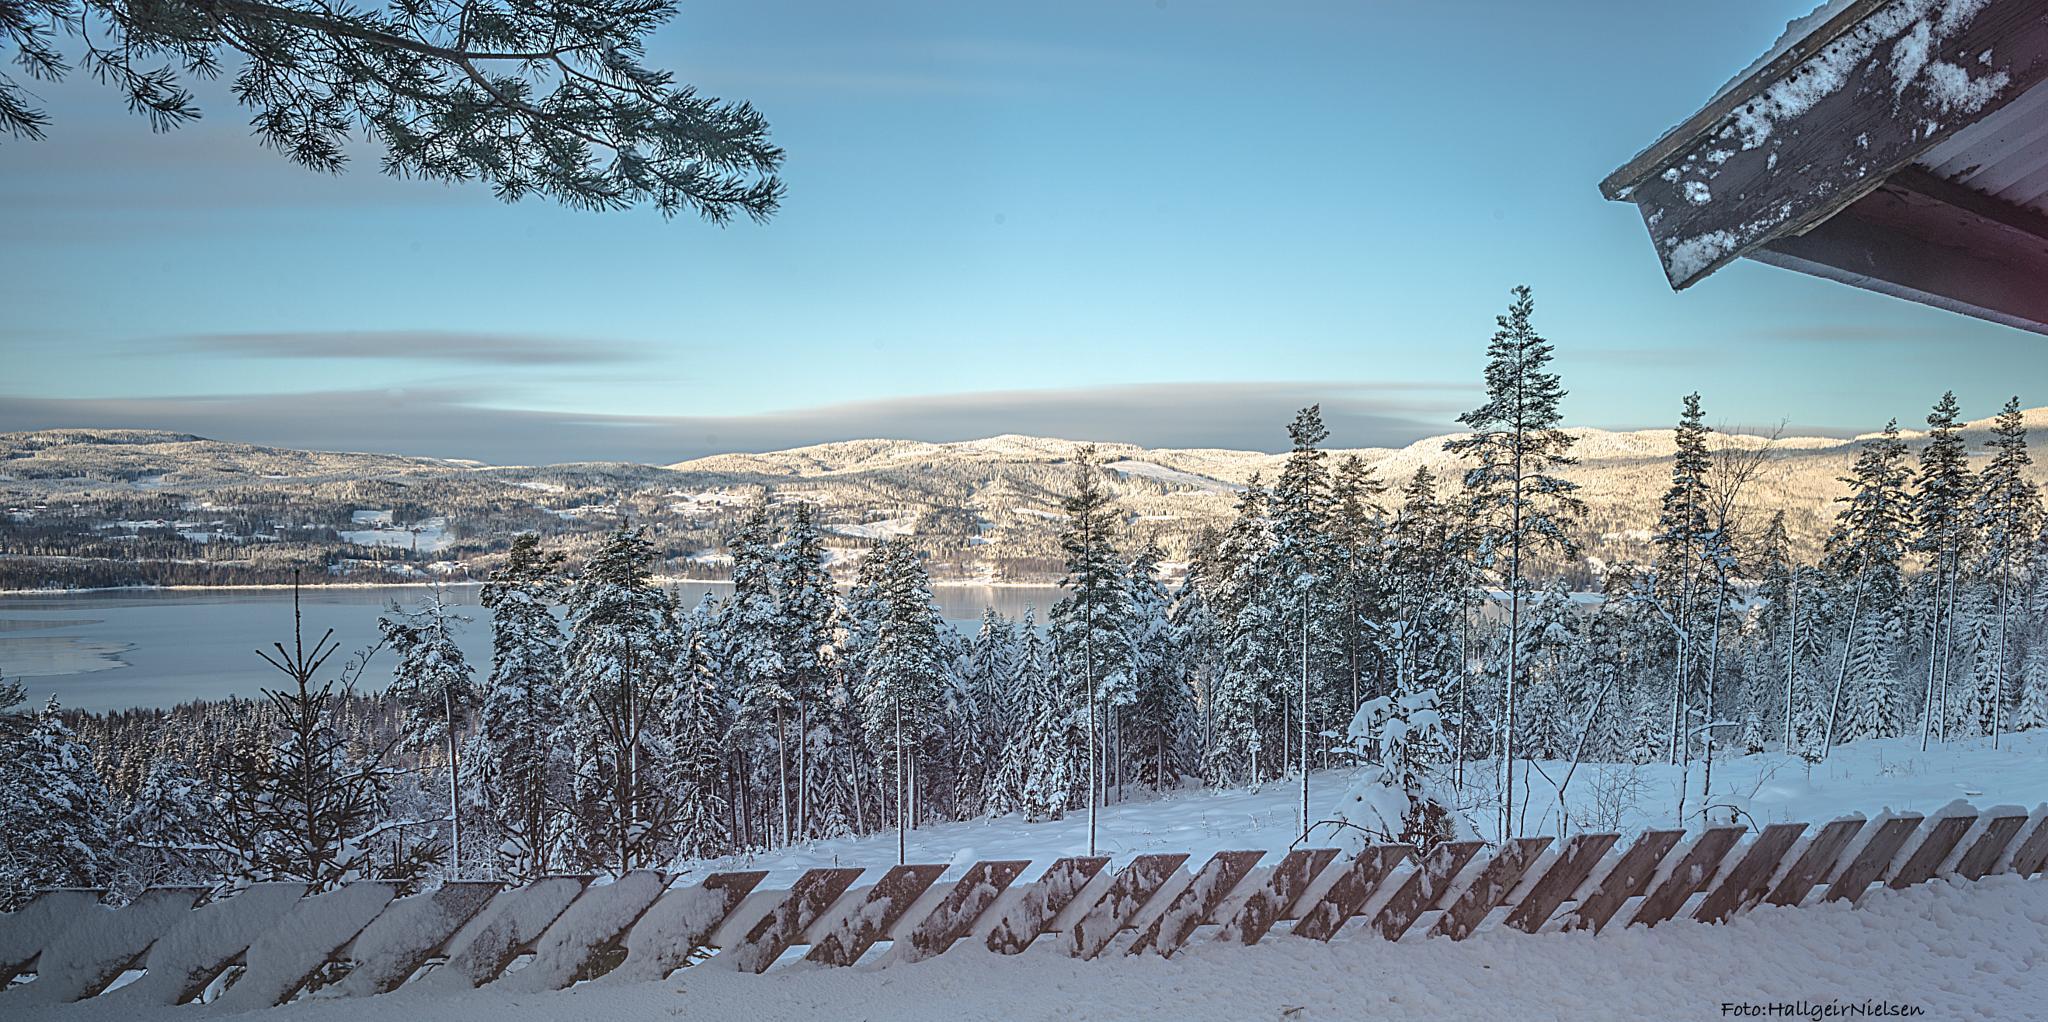 Cold Feberuar morning by Hallgeir Nielsen